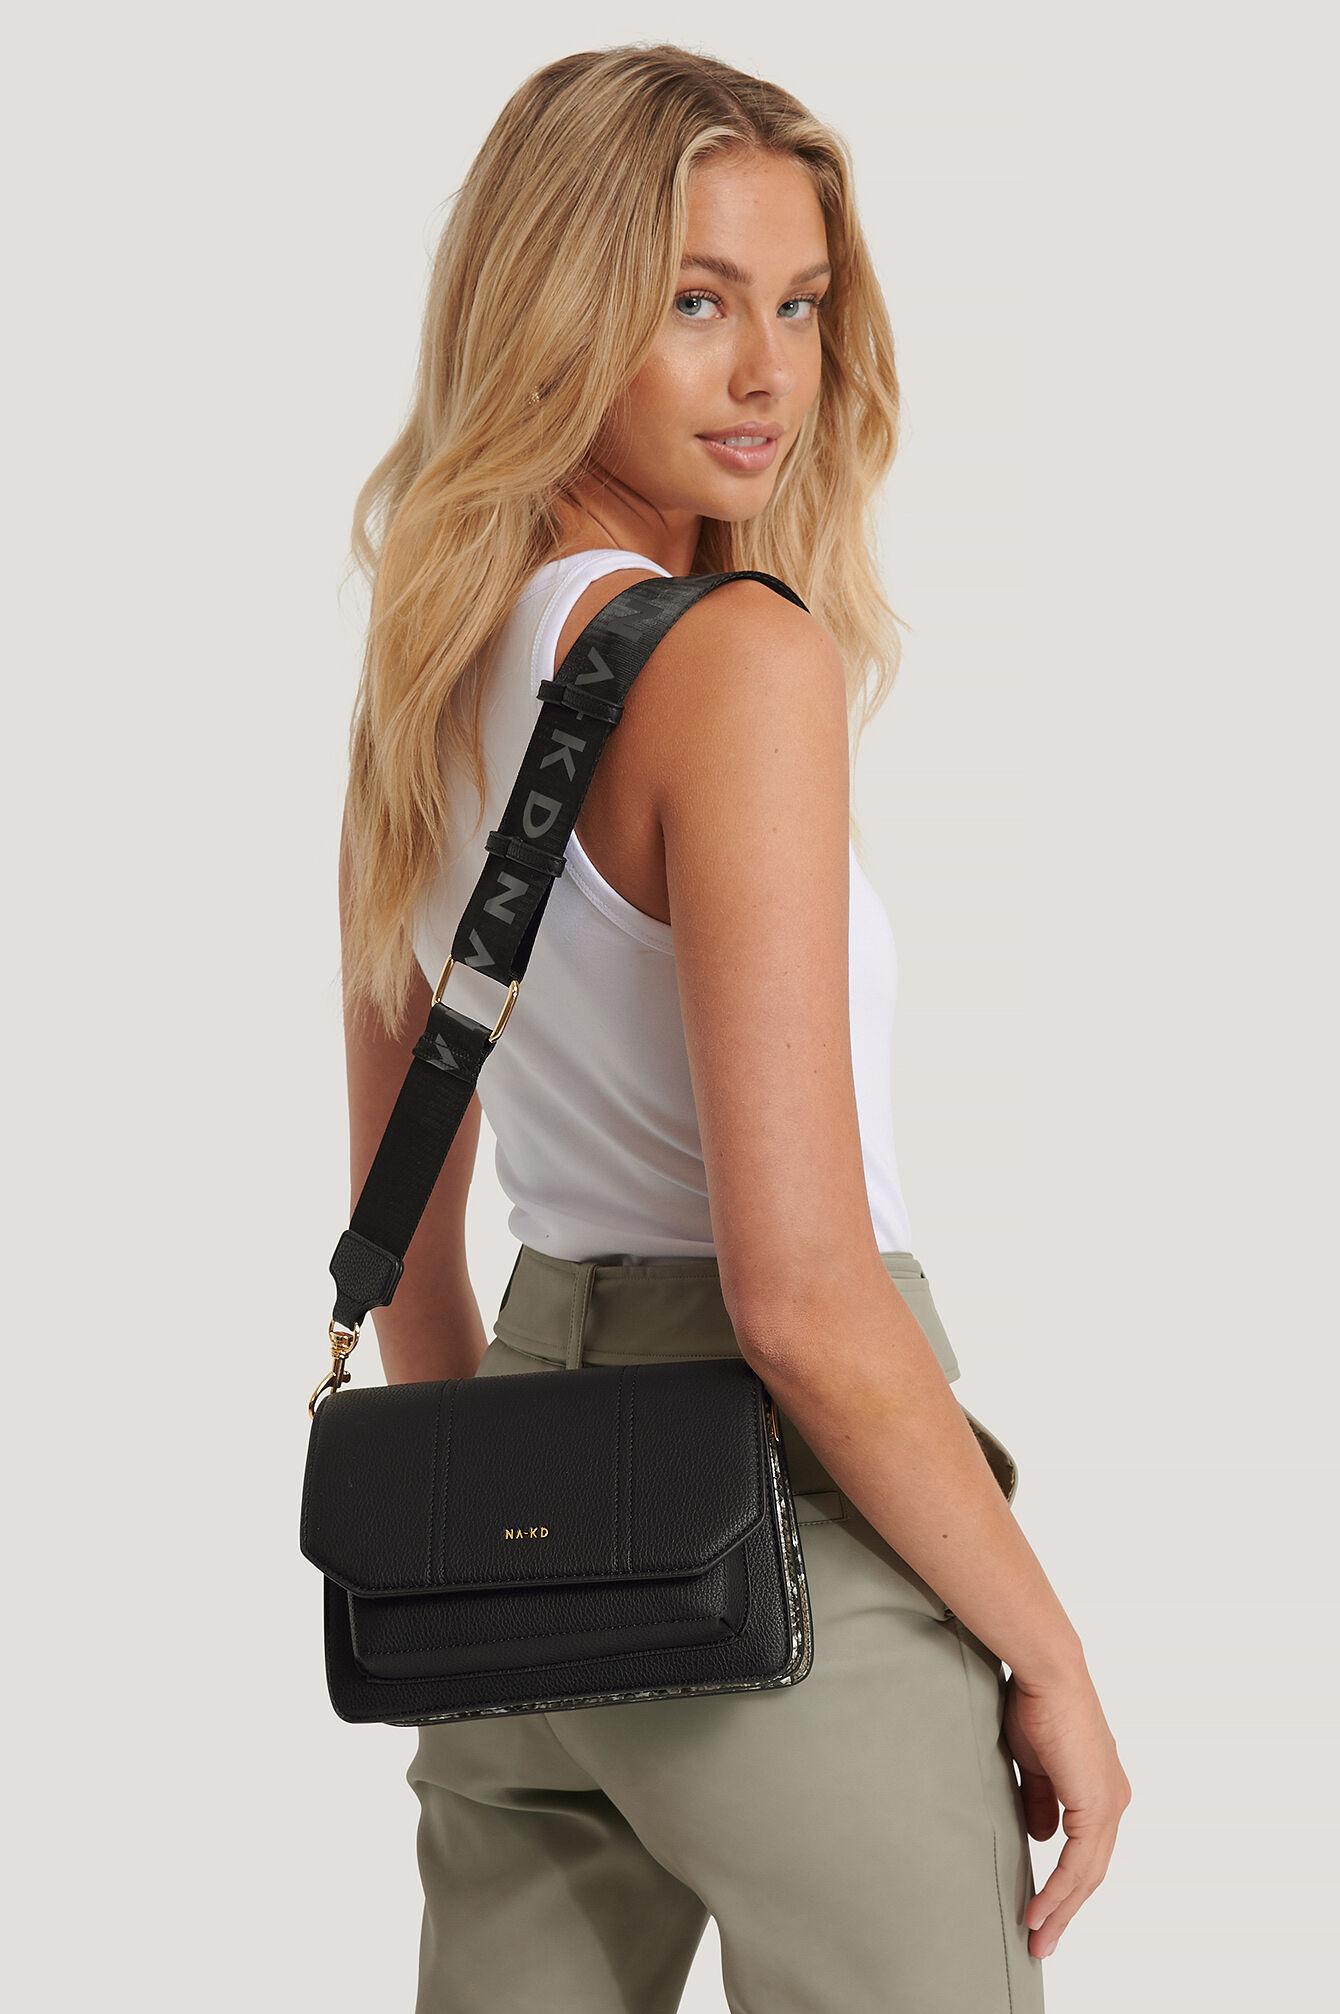 NA-KD Accessories Snake Detailed Crossover Bag - Black